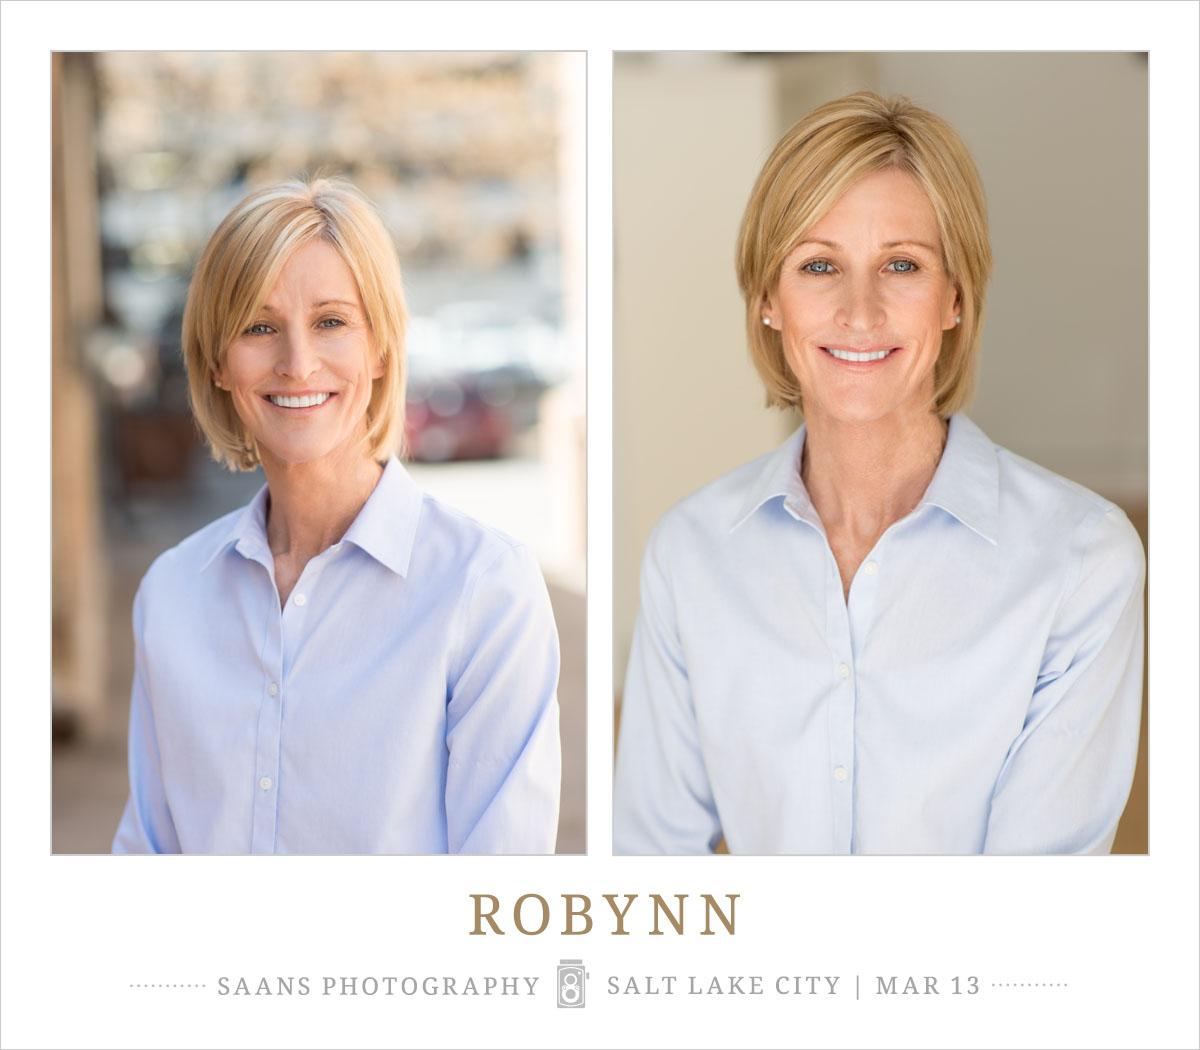 Robynn Executive Portrait